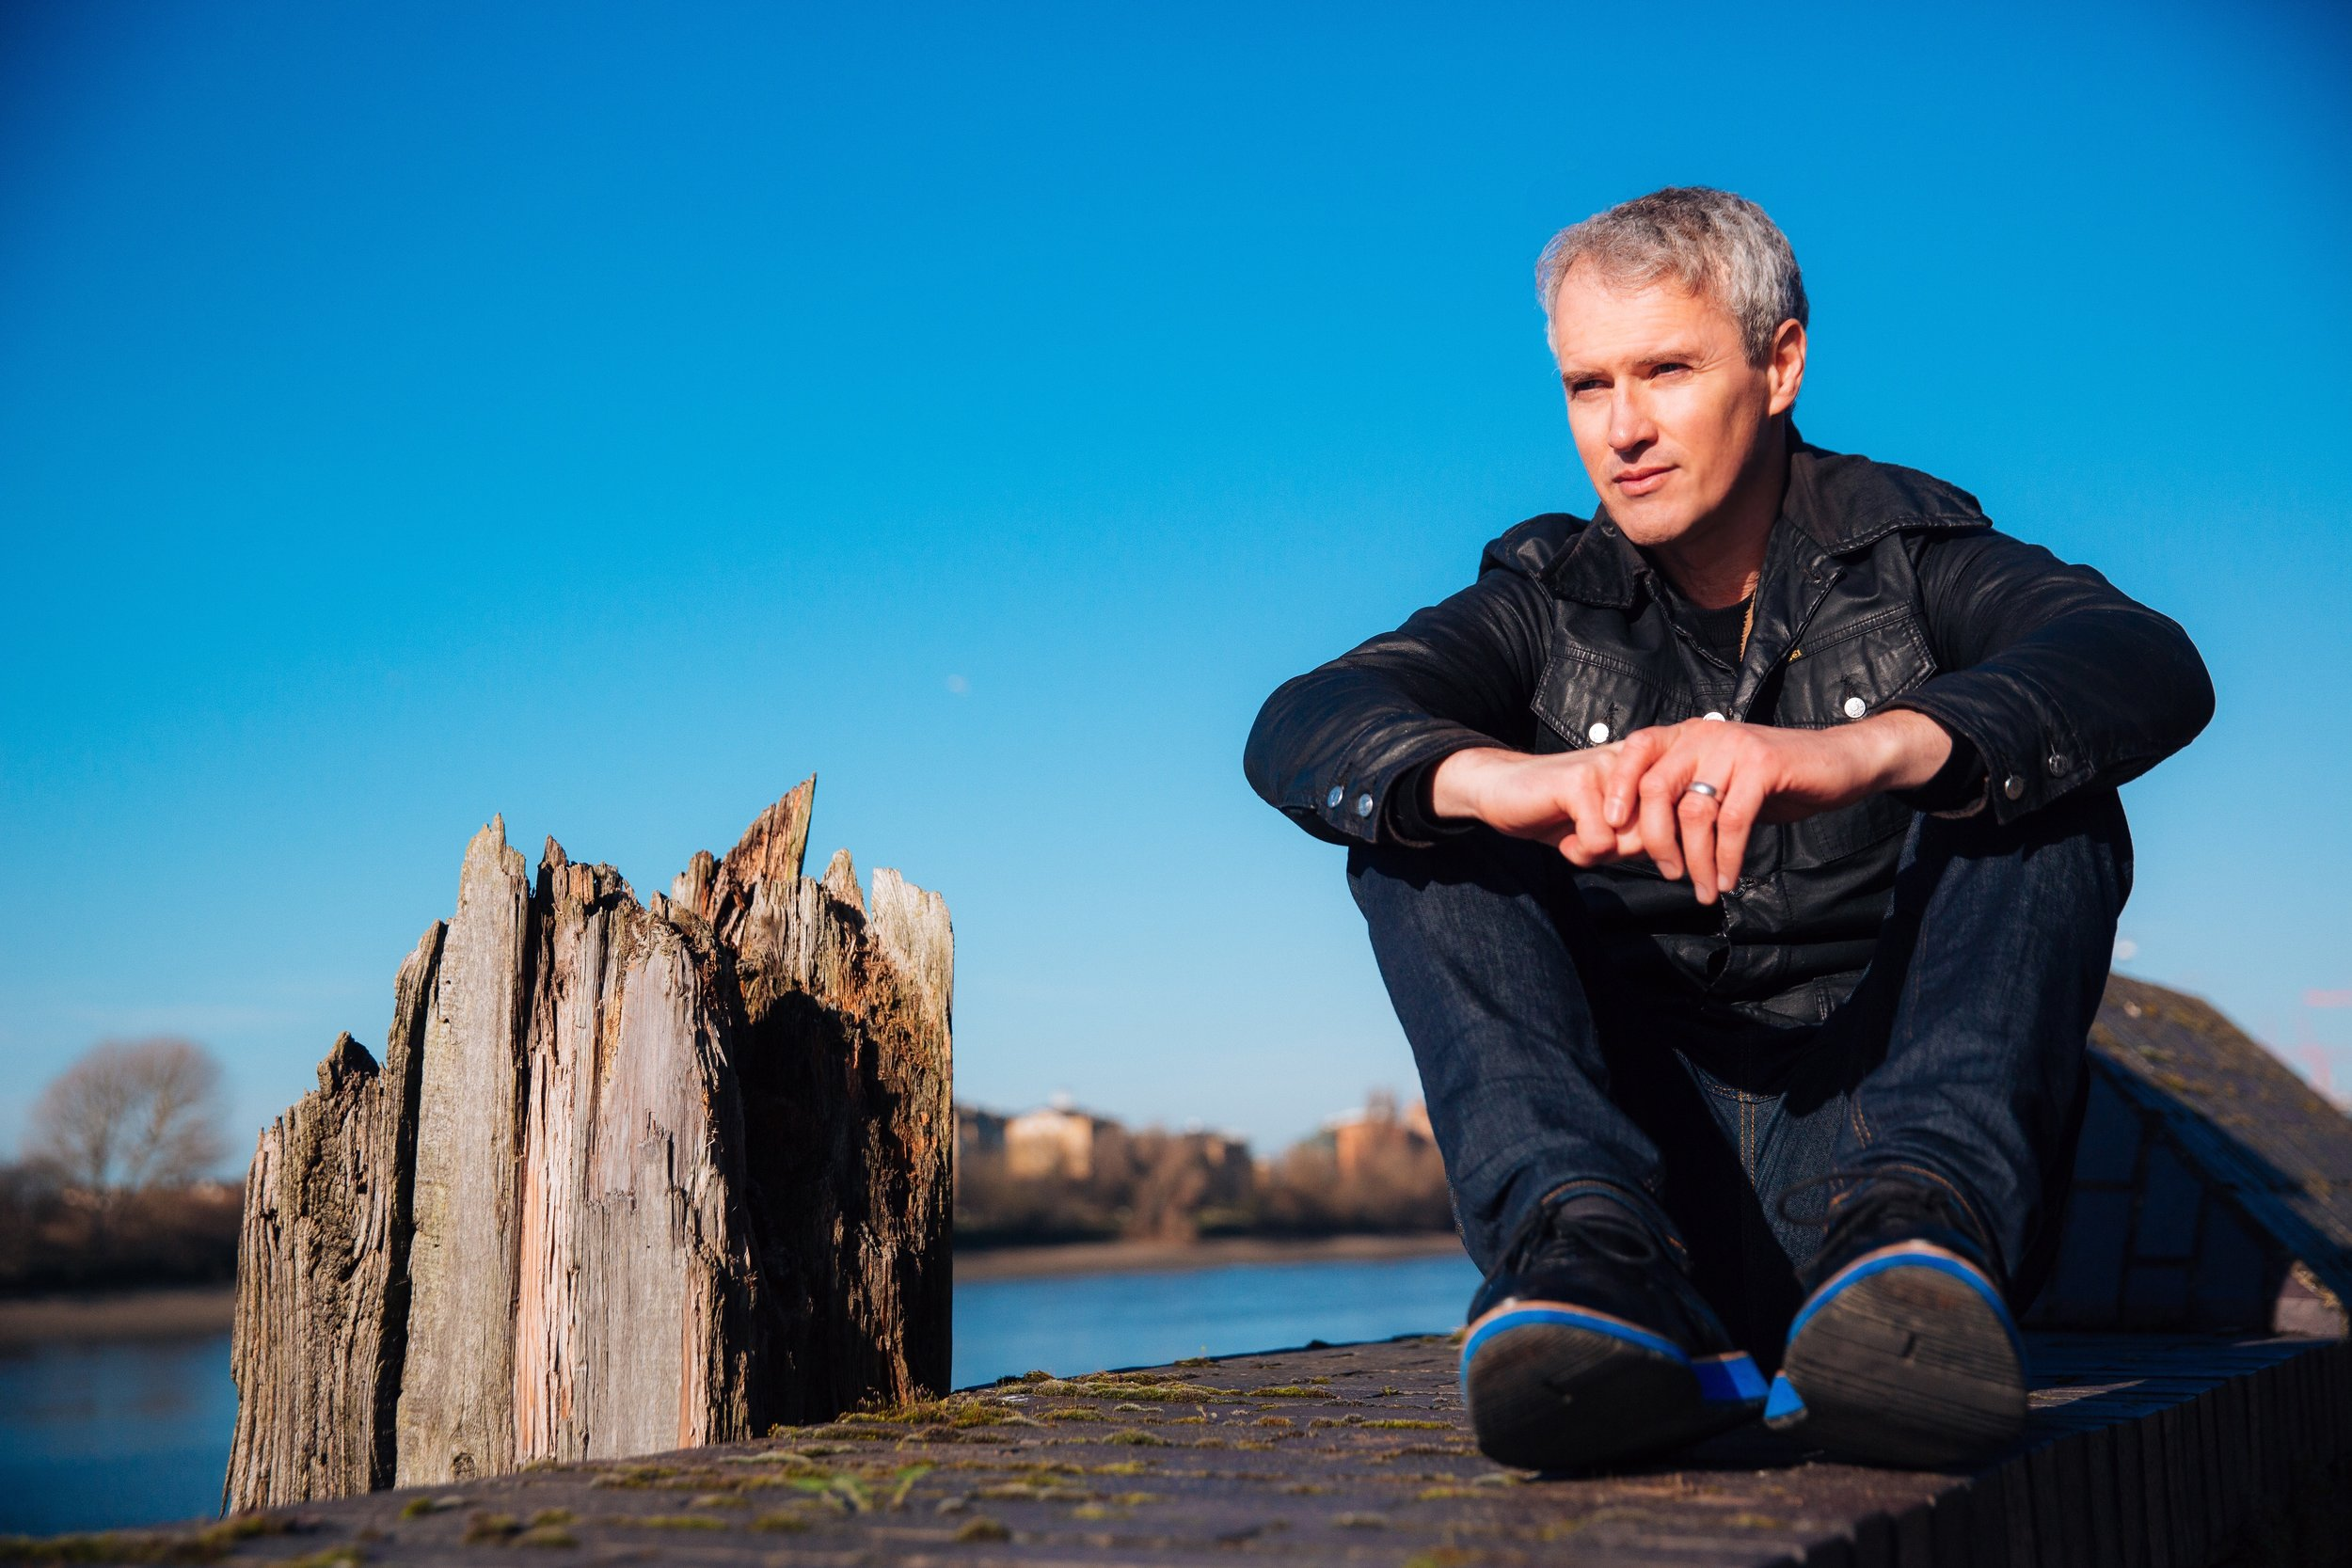 Colin MacIntyre Mull taken by Ben Morse1.jpg